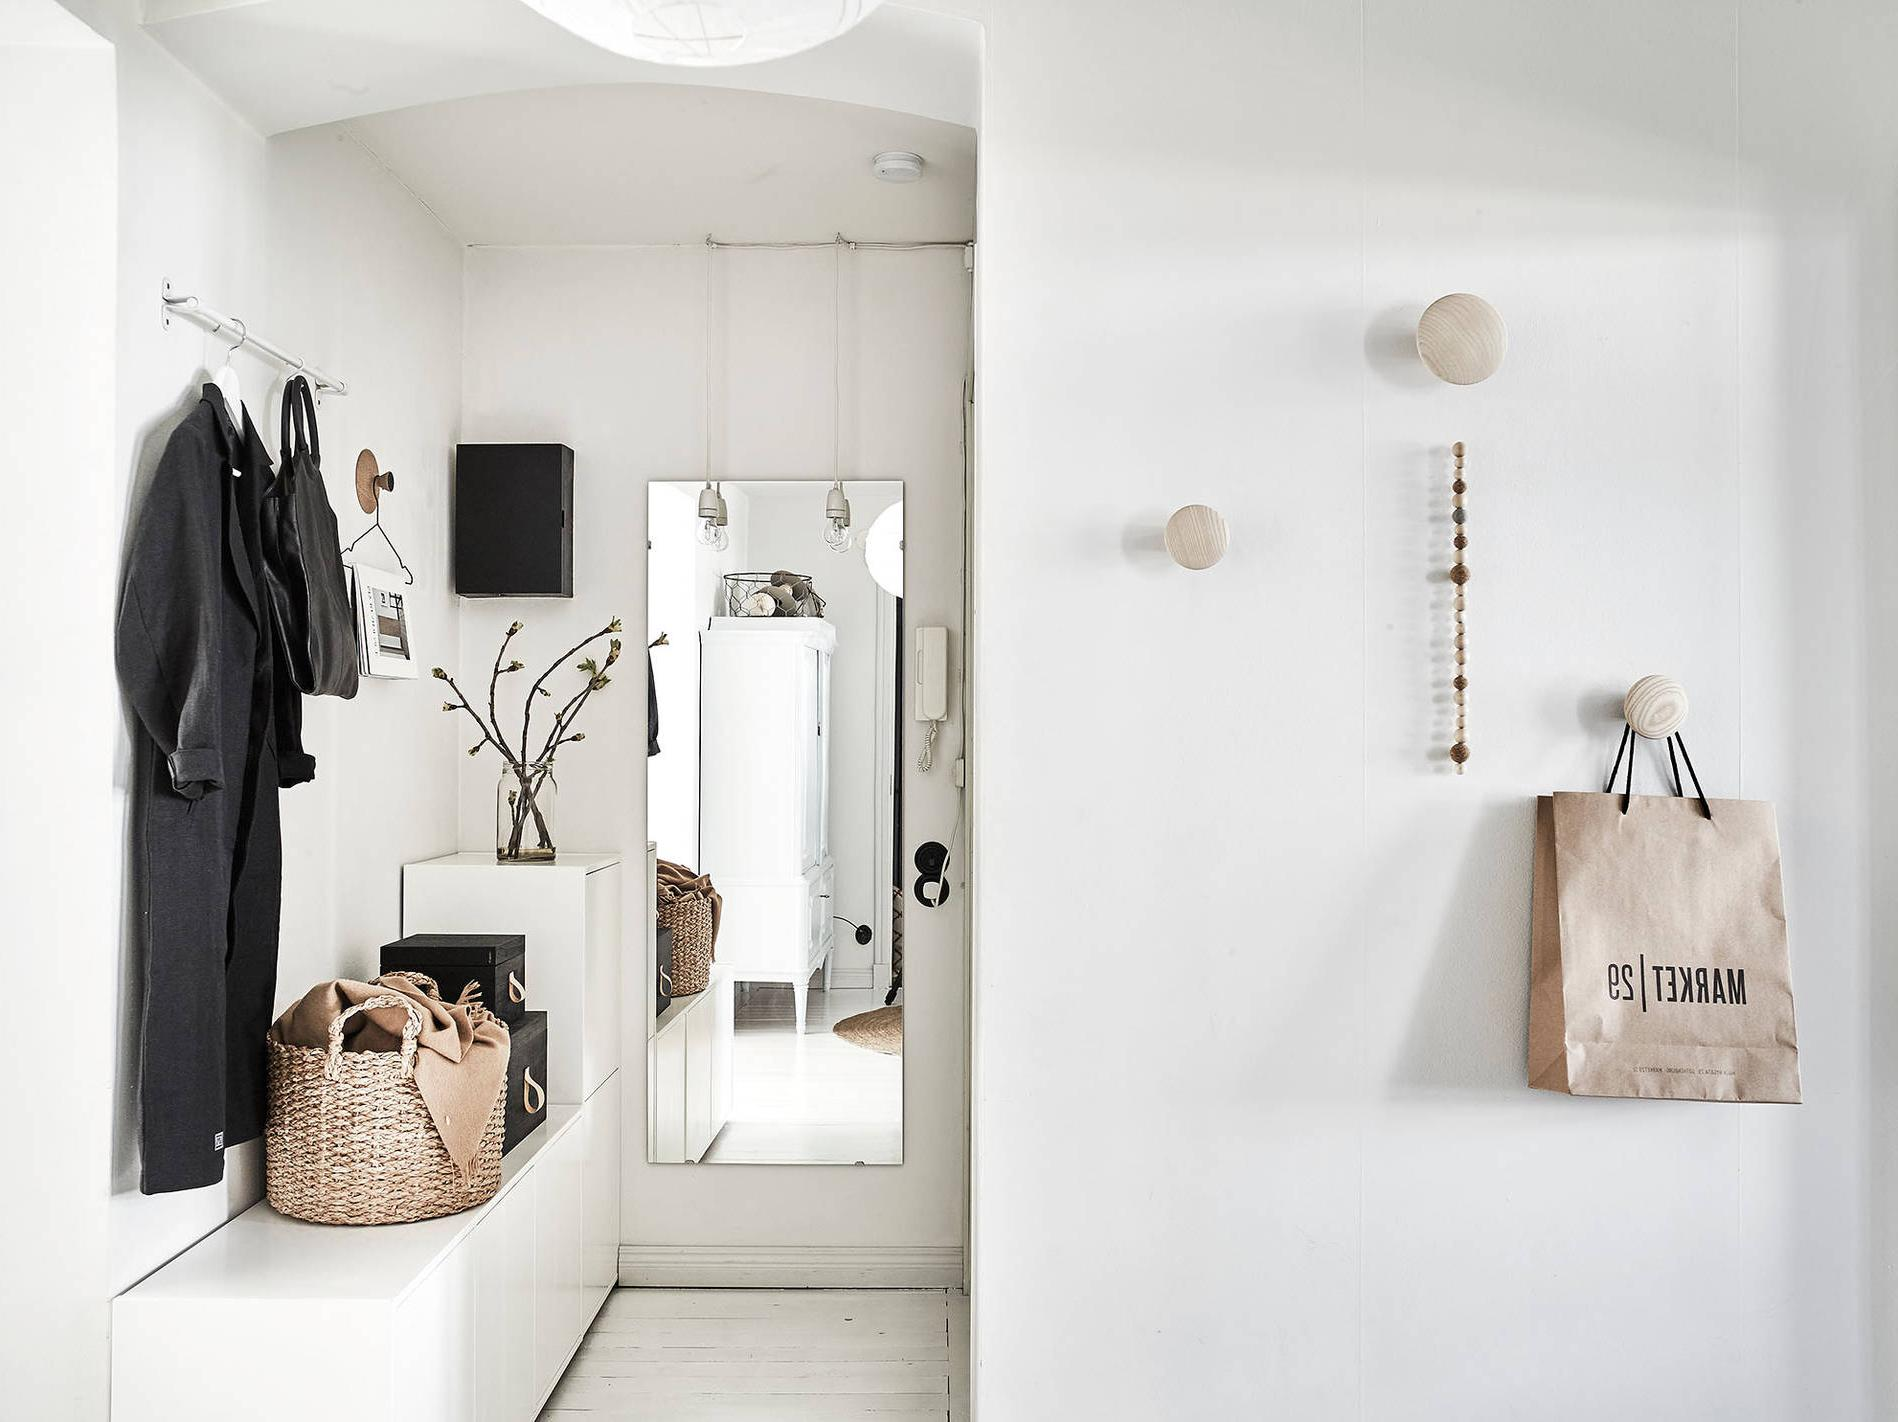 квартира в скандинавском стиле фото интерьера